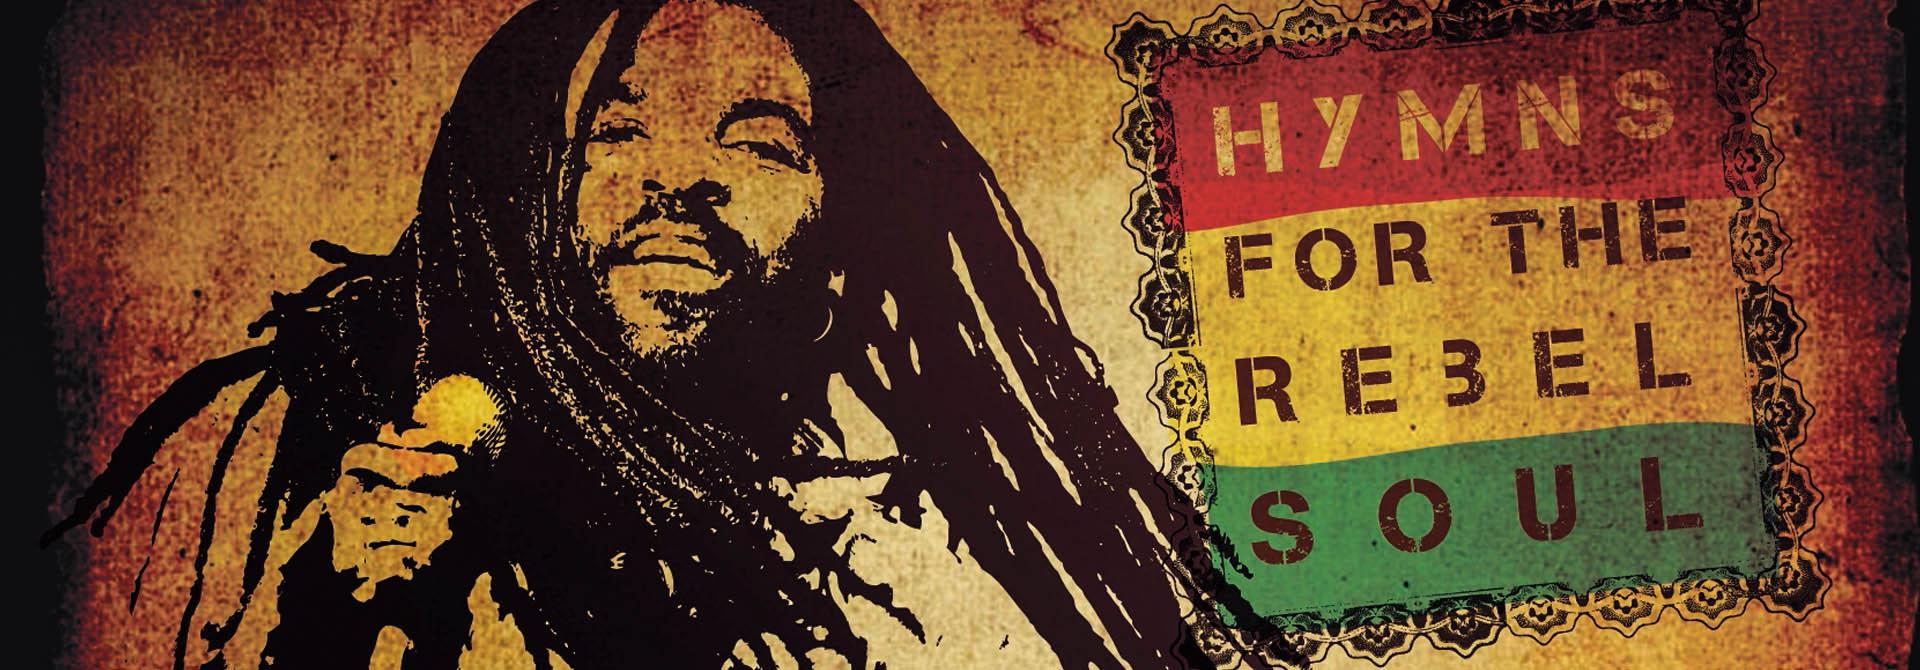 Afro Roots Artist Rocky Dawuni Album